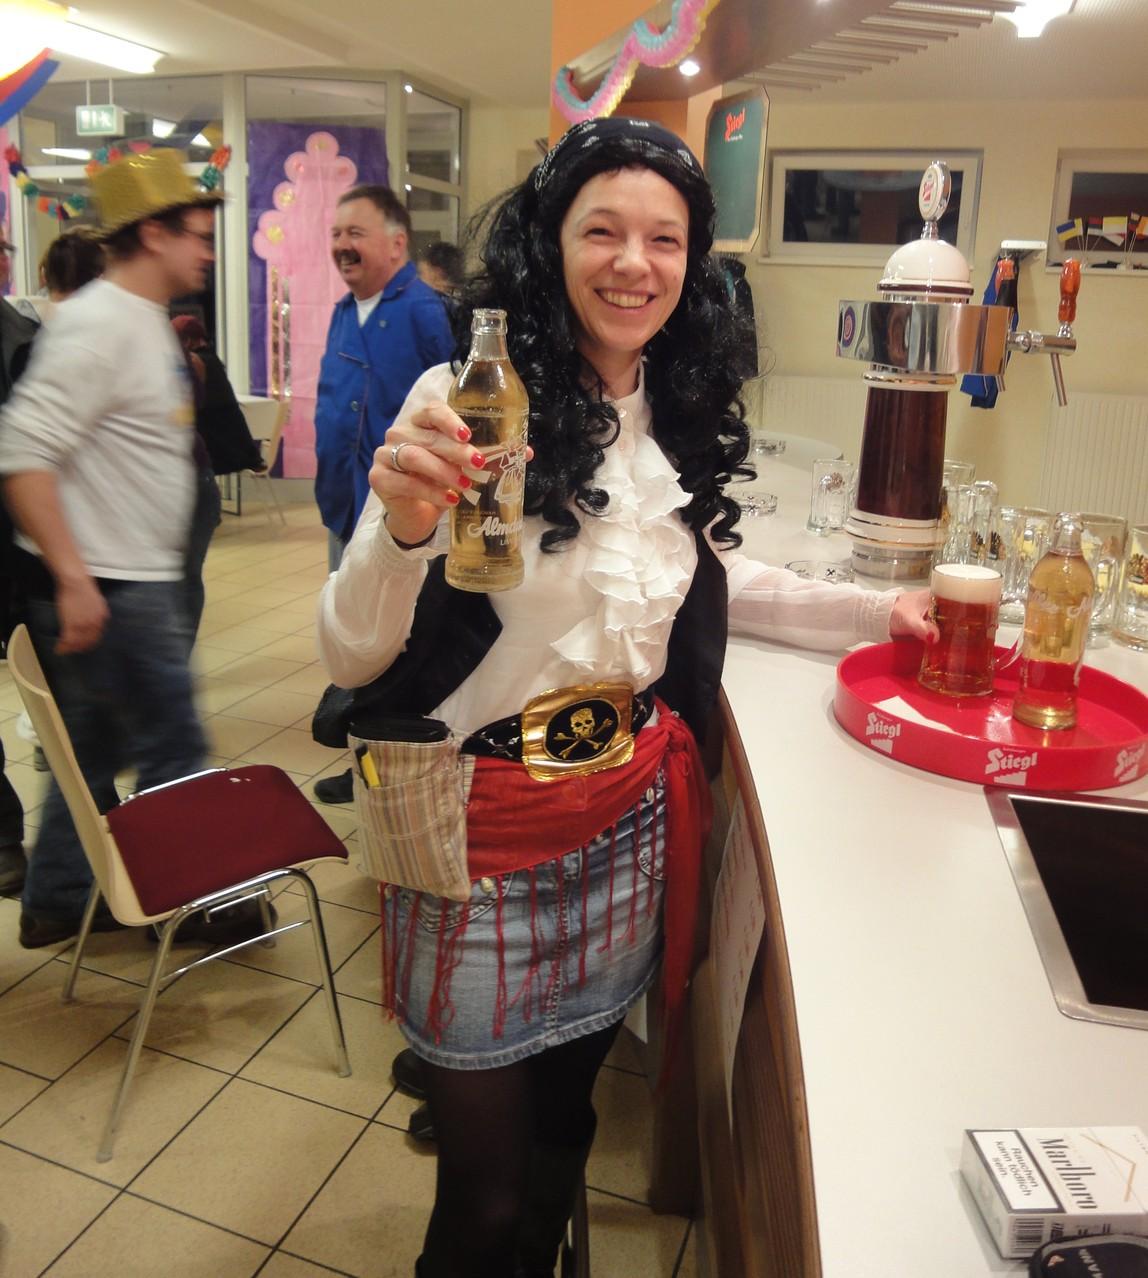 Piratenkellnerin